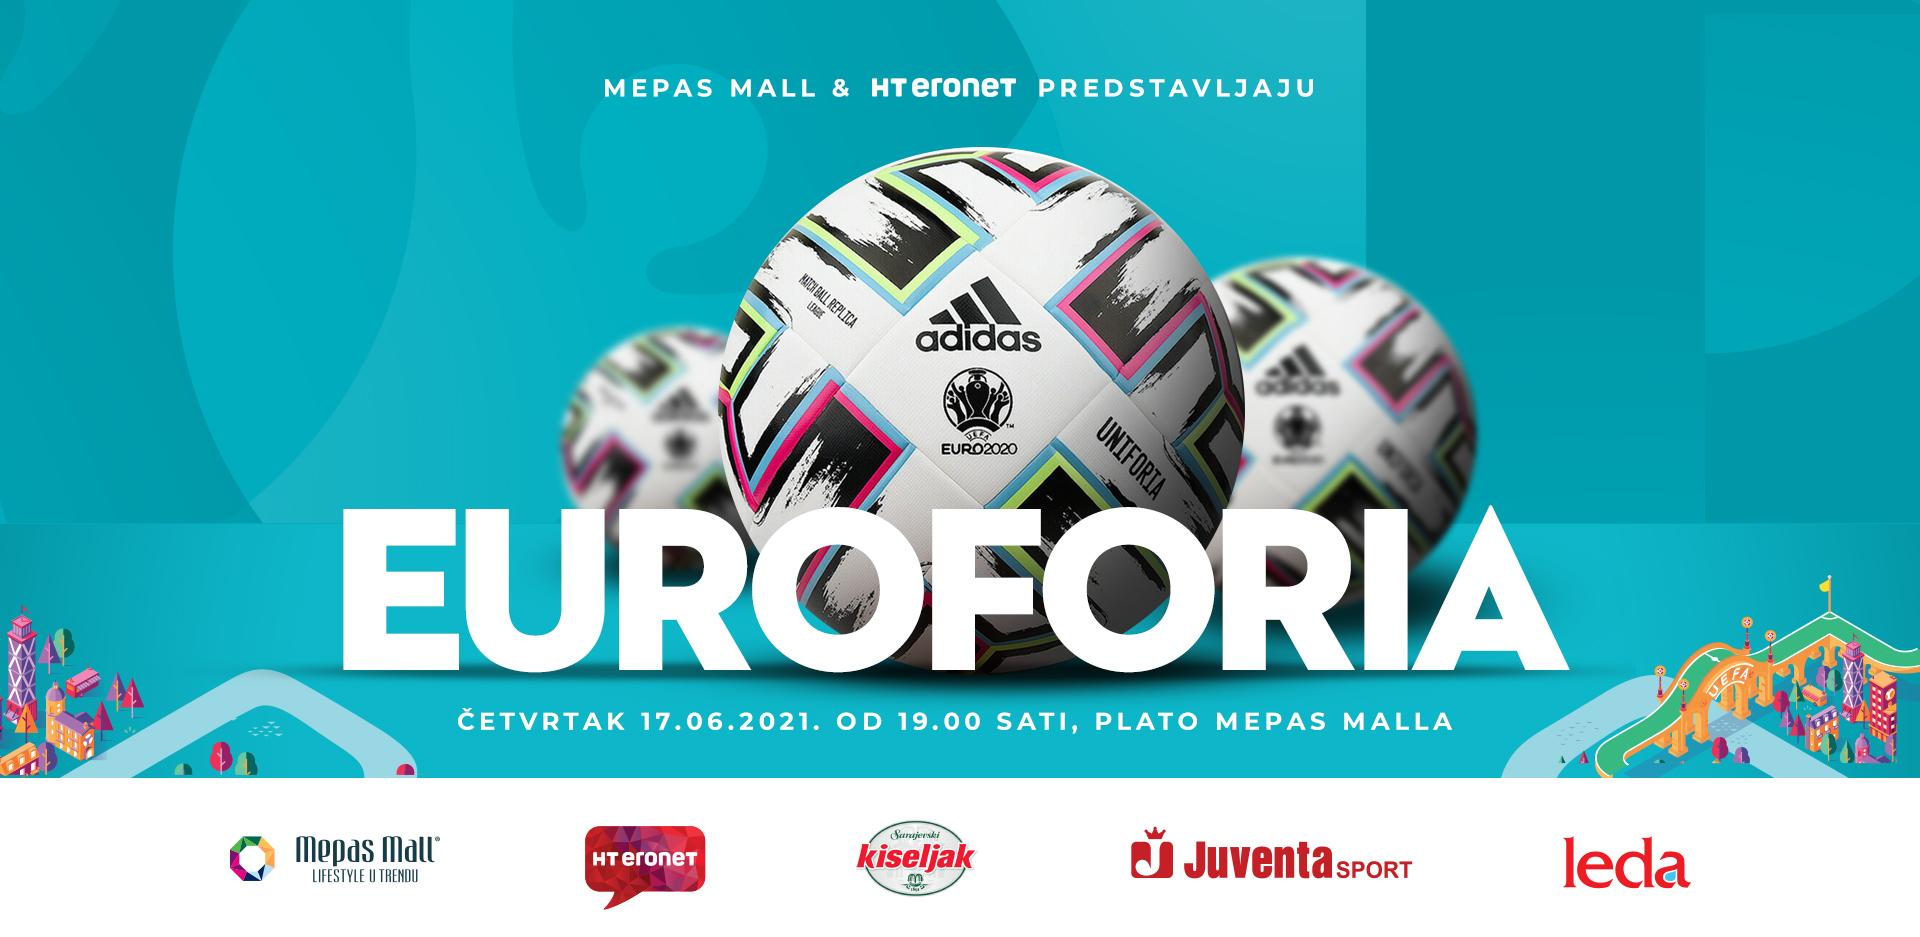 Mepas Mall i HT Eronet EUROFORIA